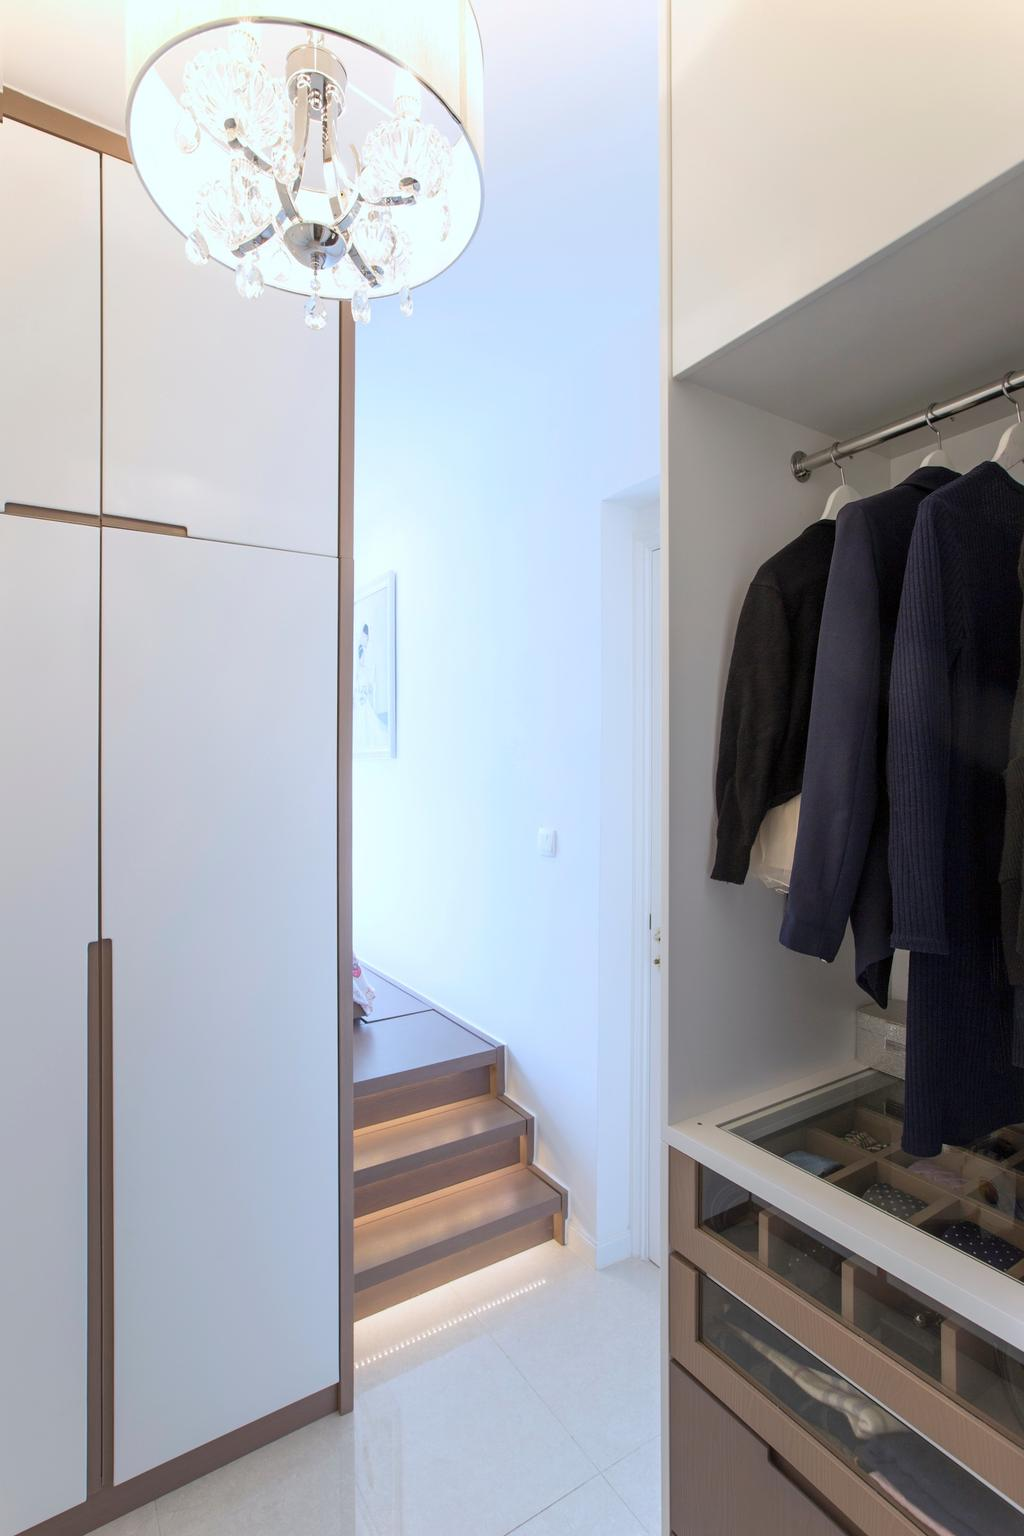 摩登, 私家樓, 睡房, 緻藍天, 室內設計師, am PLUS, Coat Rack, Clothing, Coat, Overcoat, Suit